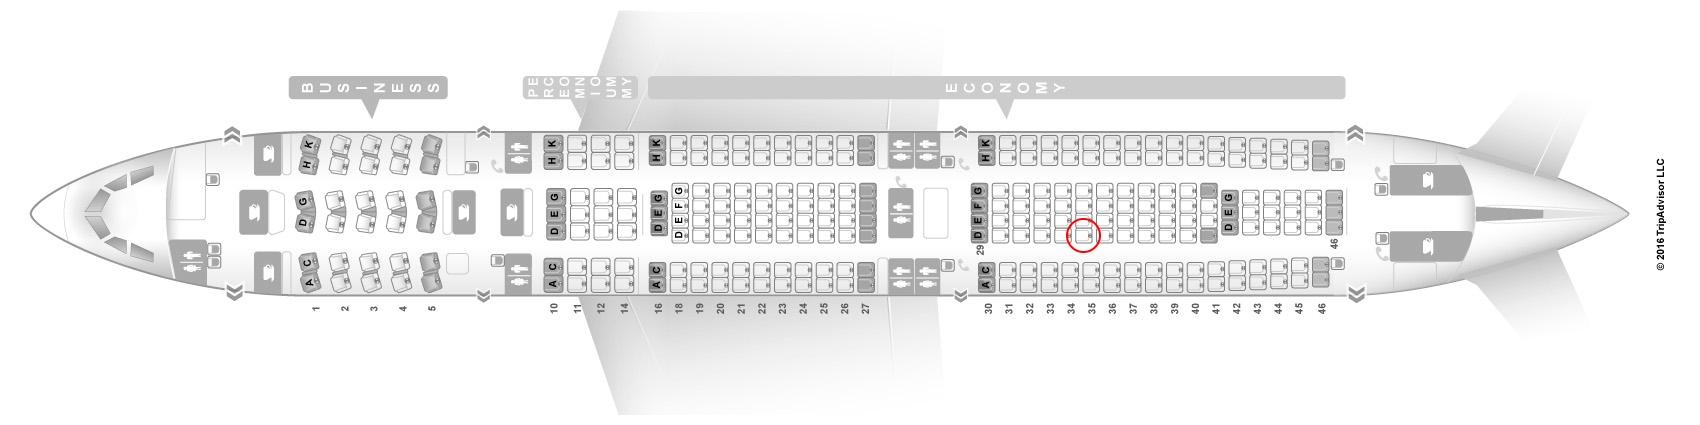 Lufthansa A340-300 seat map